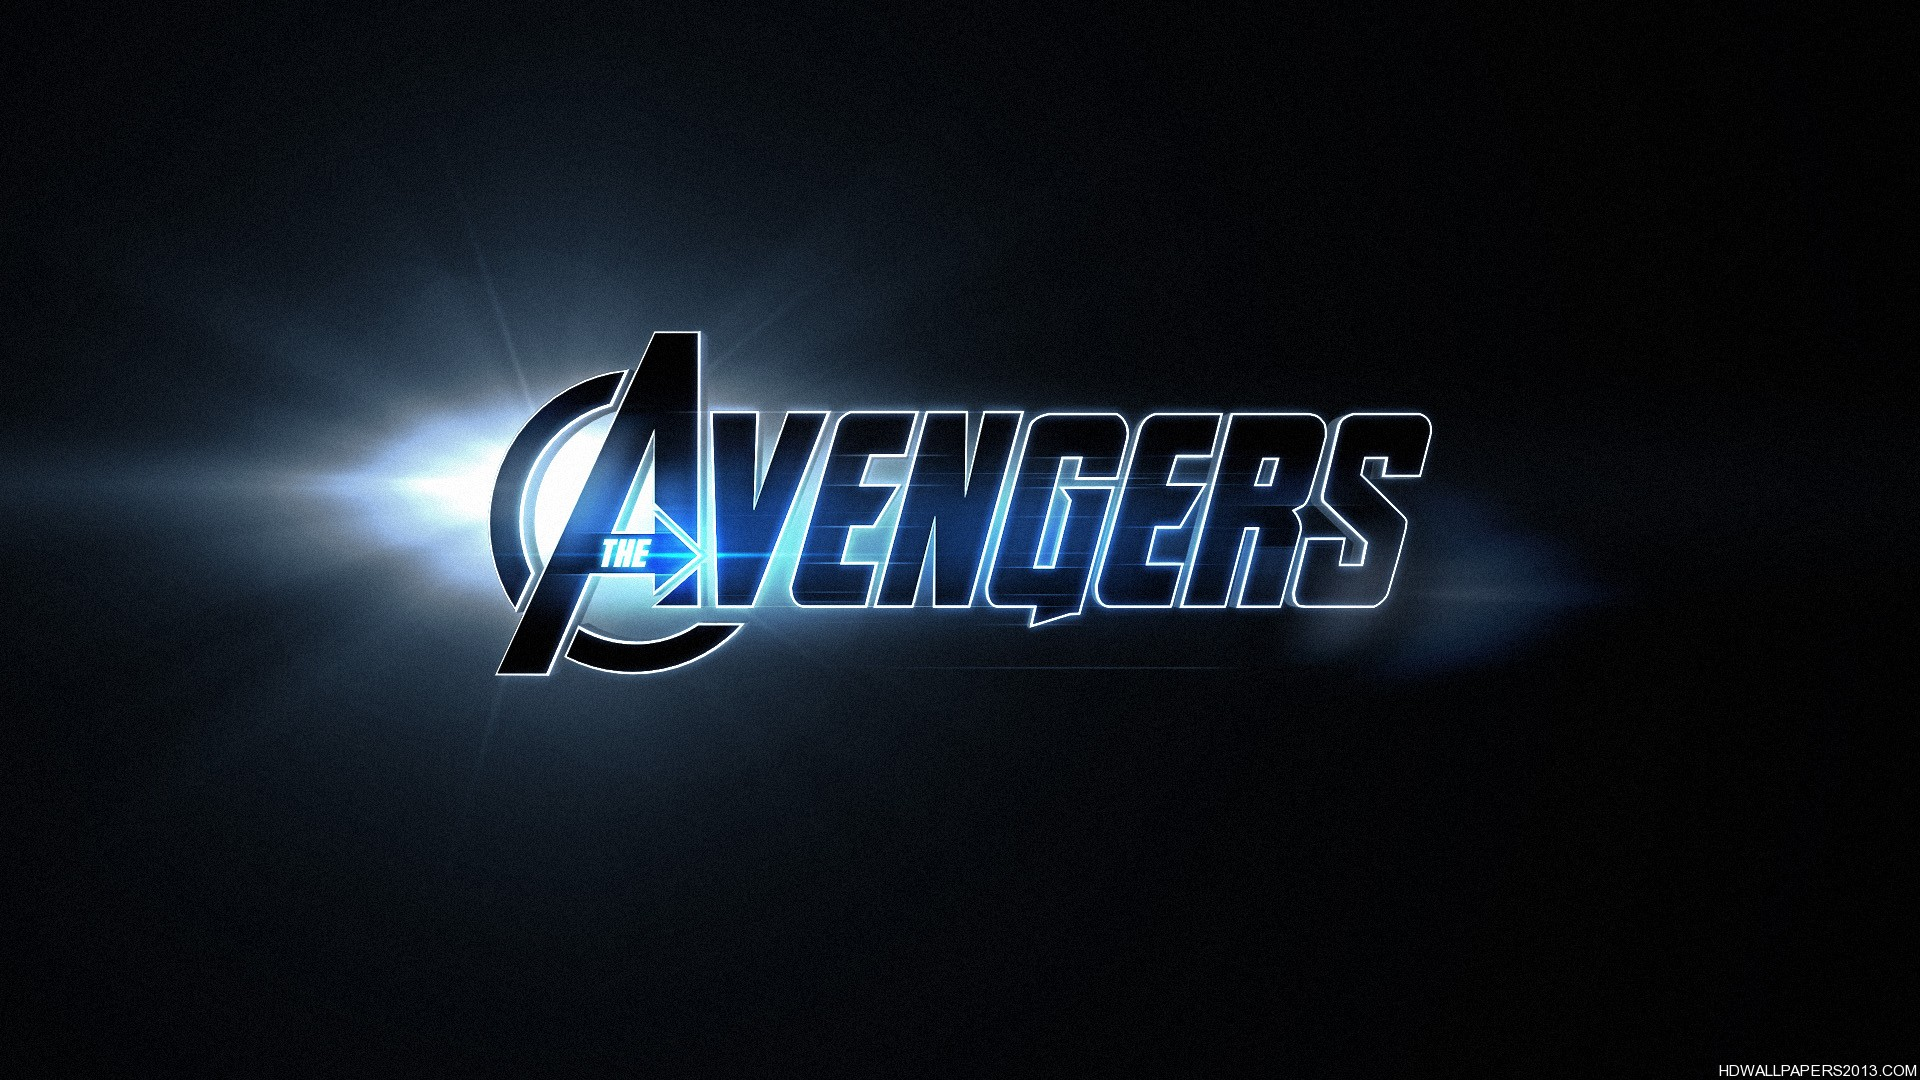 The Avengers Logo Wallpaper High Definition Wallpapers High 1920x1080